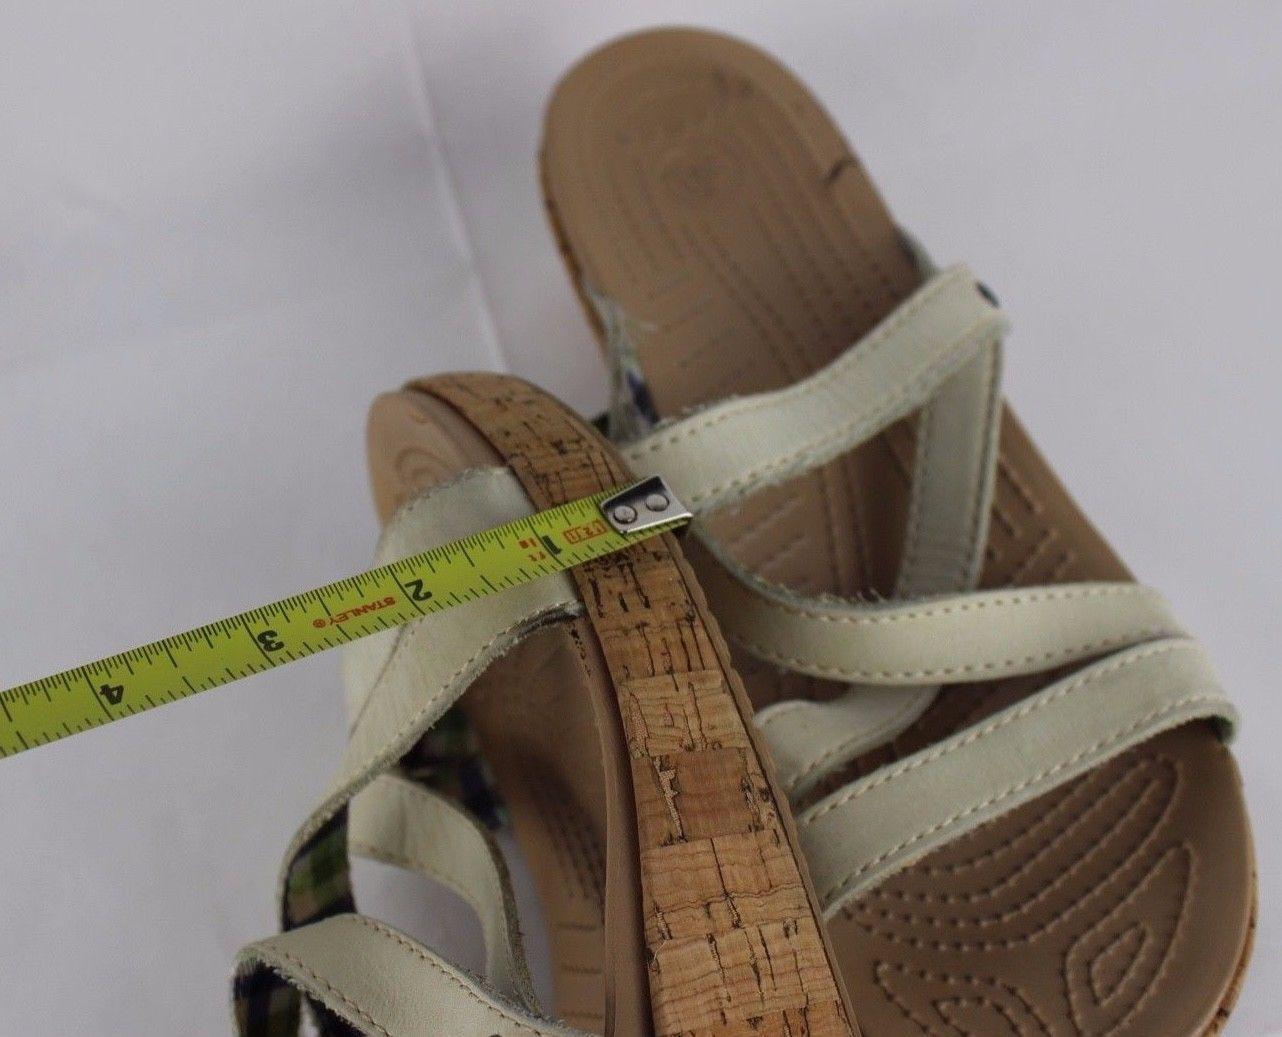 Crocs wedge women's sandals strappy leather cork slides beige size 11